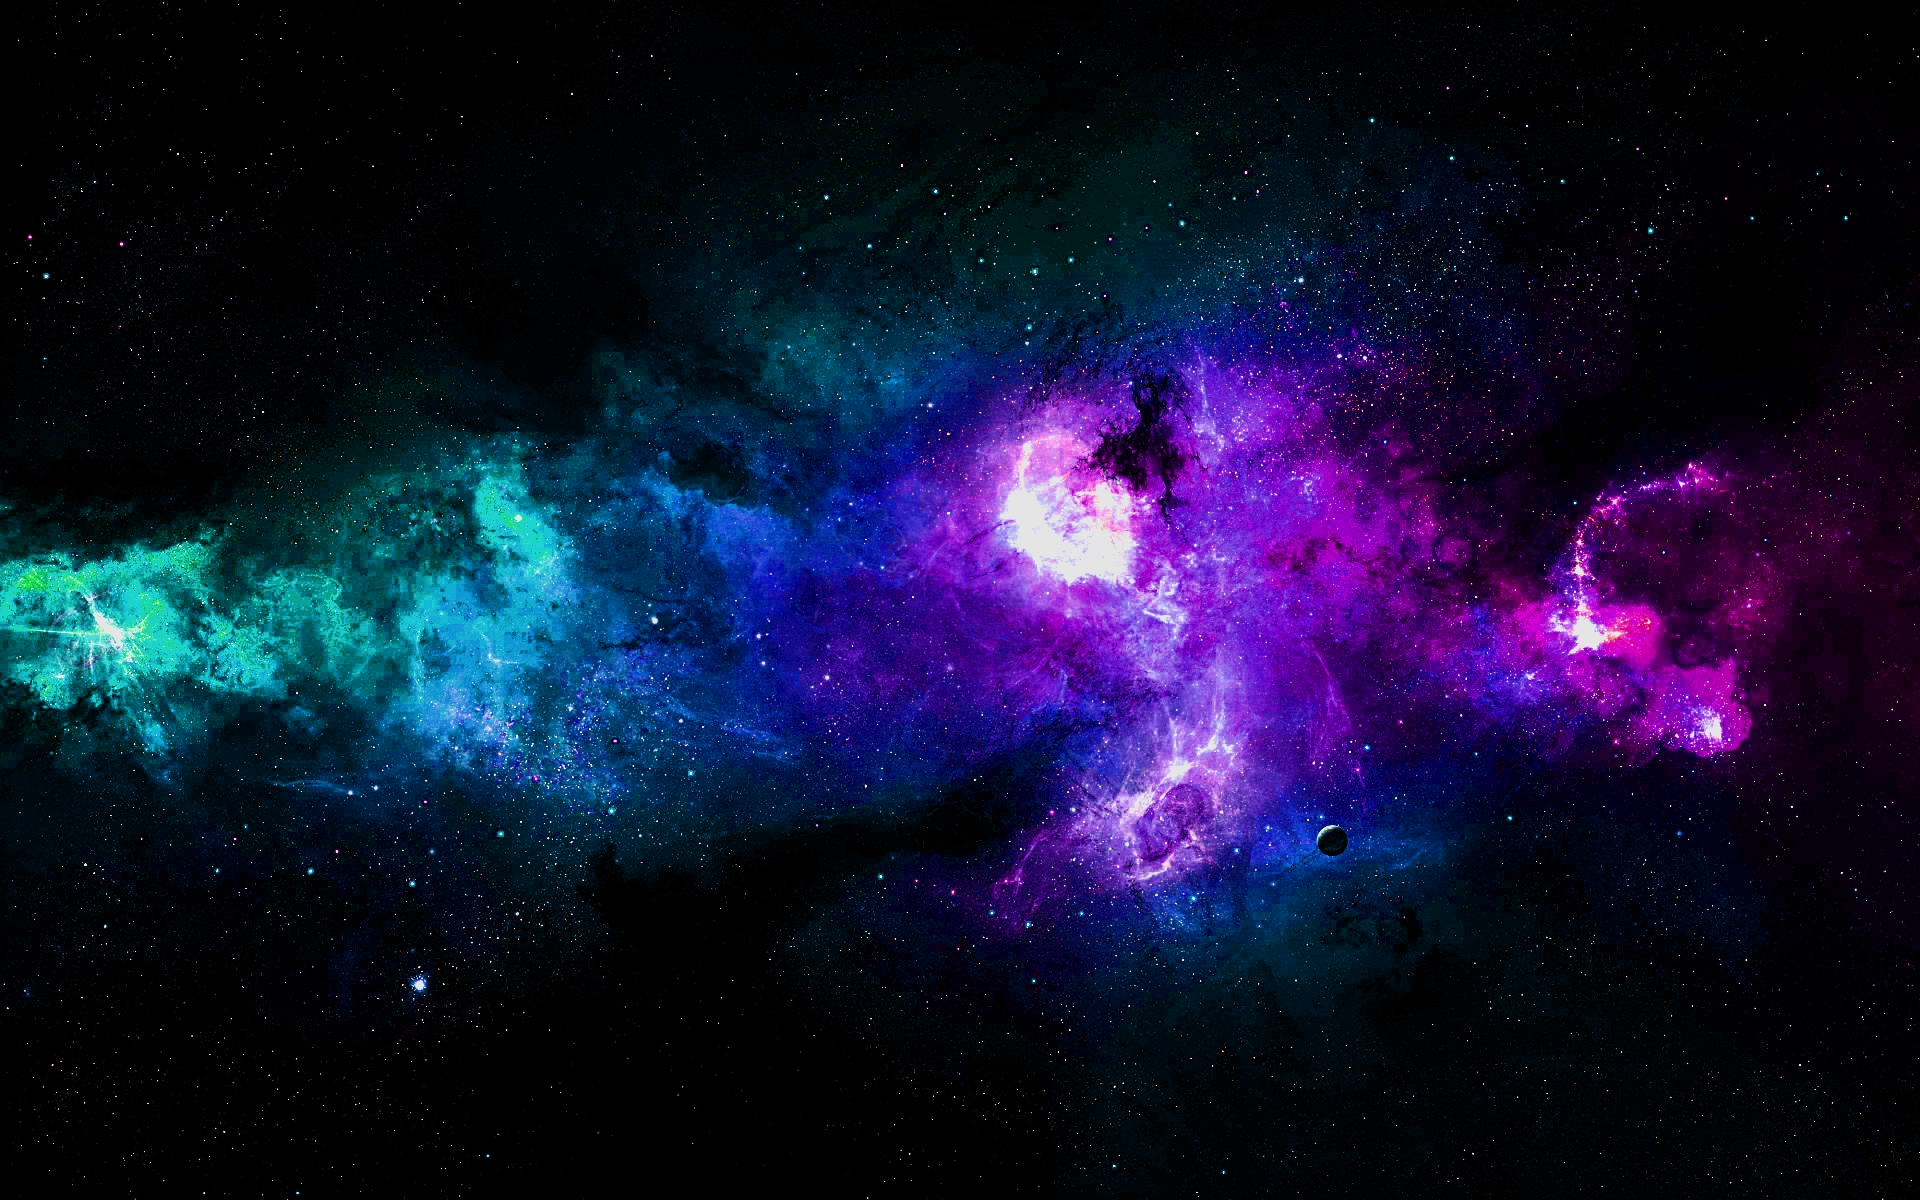 Nebula Wallpaper 1920X1200 - Pics about space